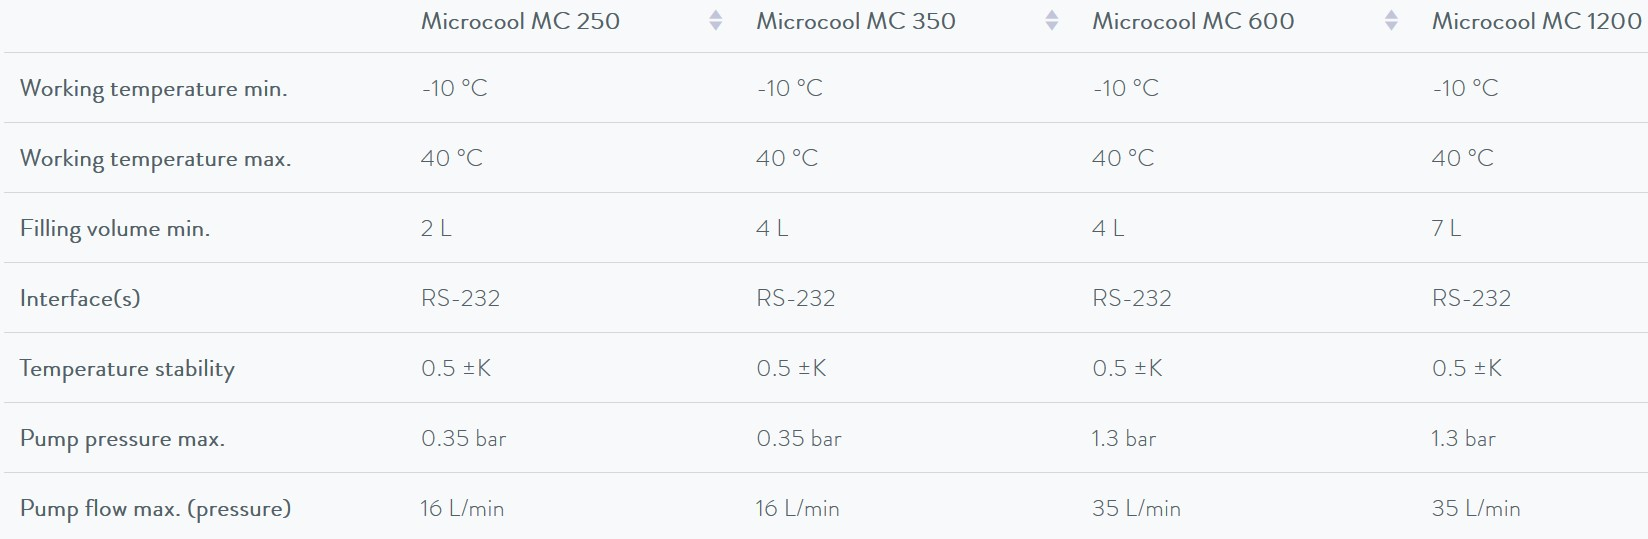 techical characteristic of Microcool LAUDA